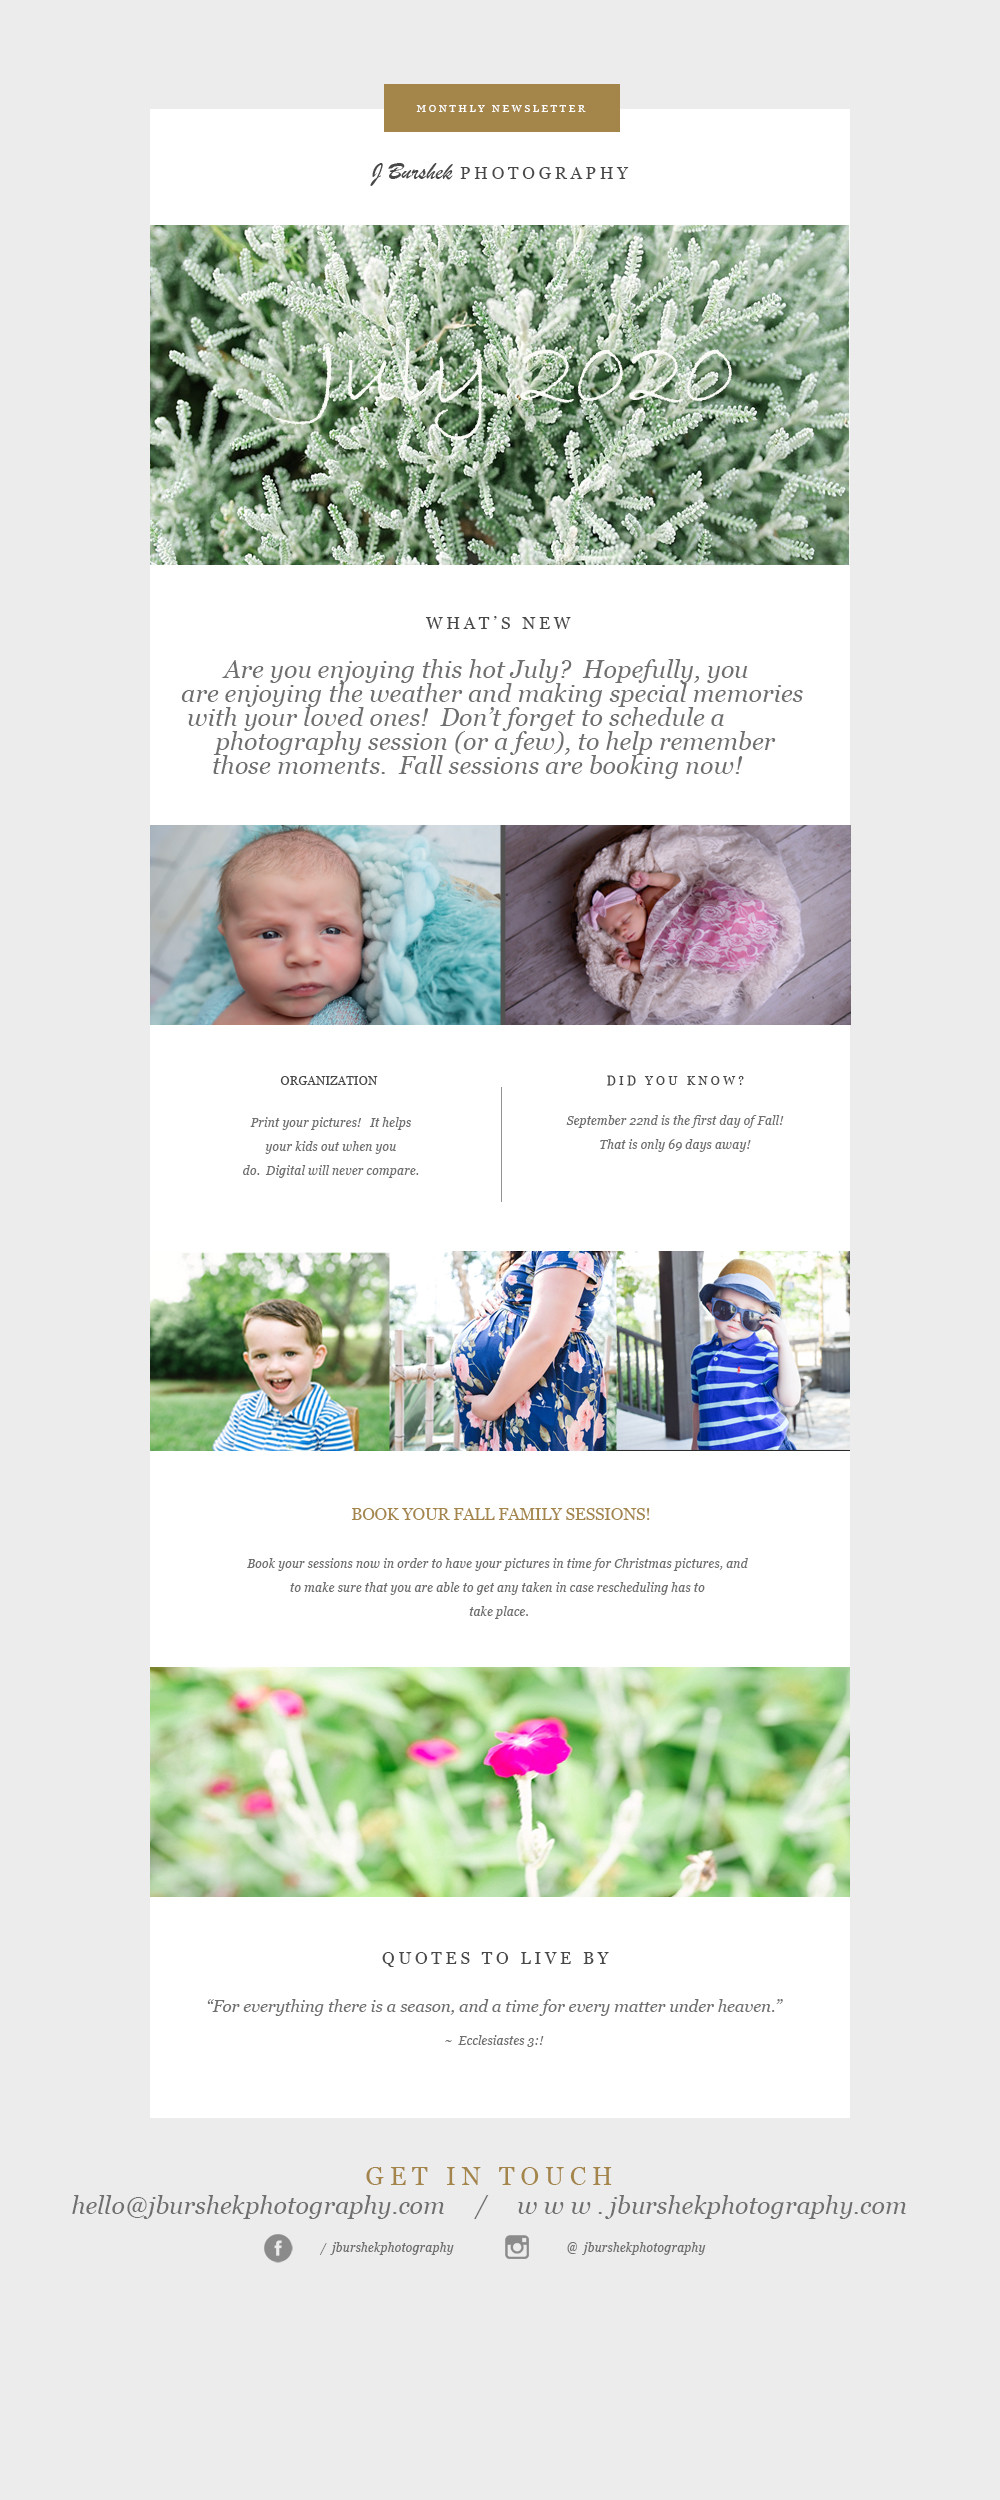 July Newsletter, J Burshek Photography, Flowers, Edmond, Oklahoma, Photographer, Fall Sessions, Family Photographer, Style, Kid Photographer, Maternity Pictures, Organizational Tips, Photography Tips, Tips